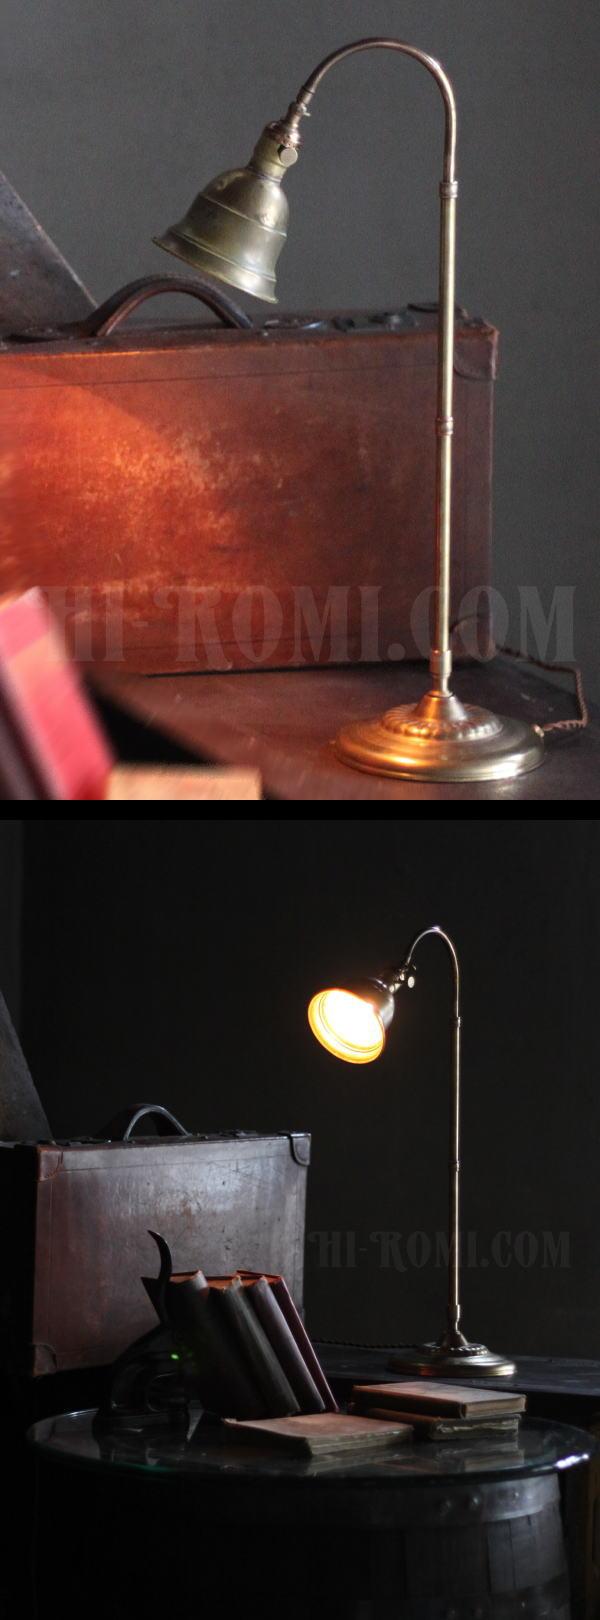 USAヴィンテージ角度調整付ファーマシー真鍮製テーブルライト/工業系アトリエ照明 20130619-1